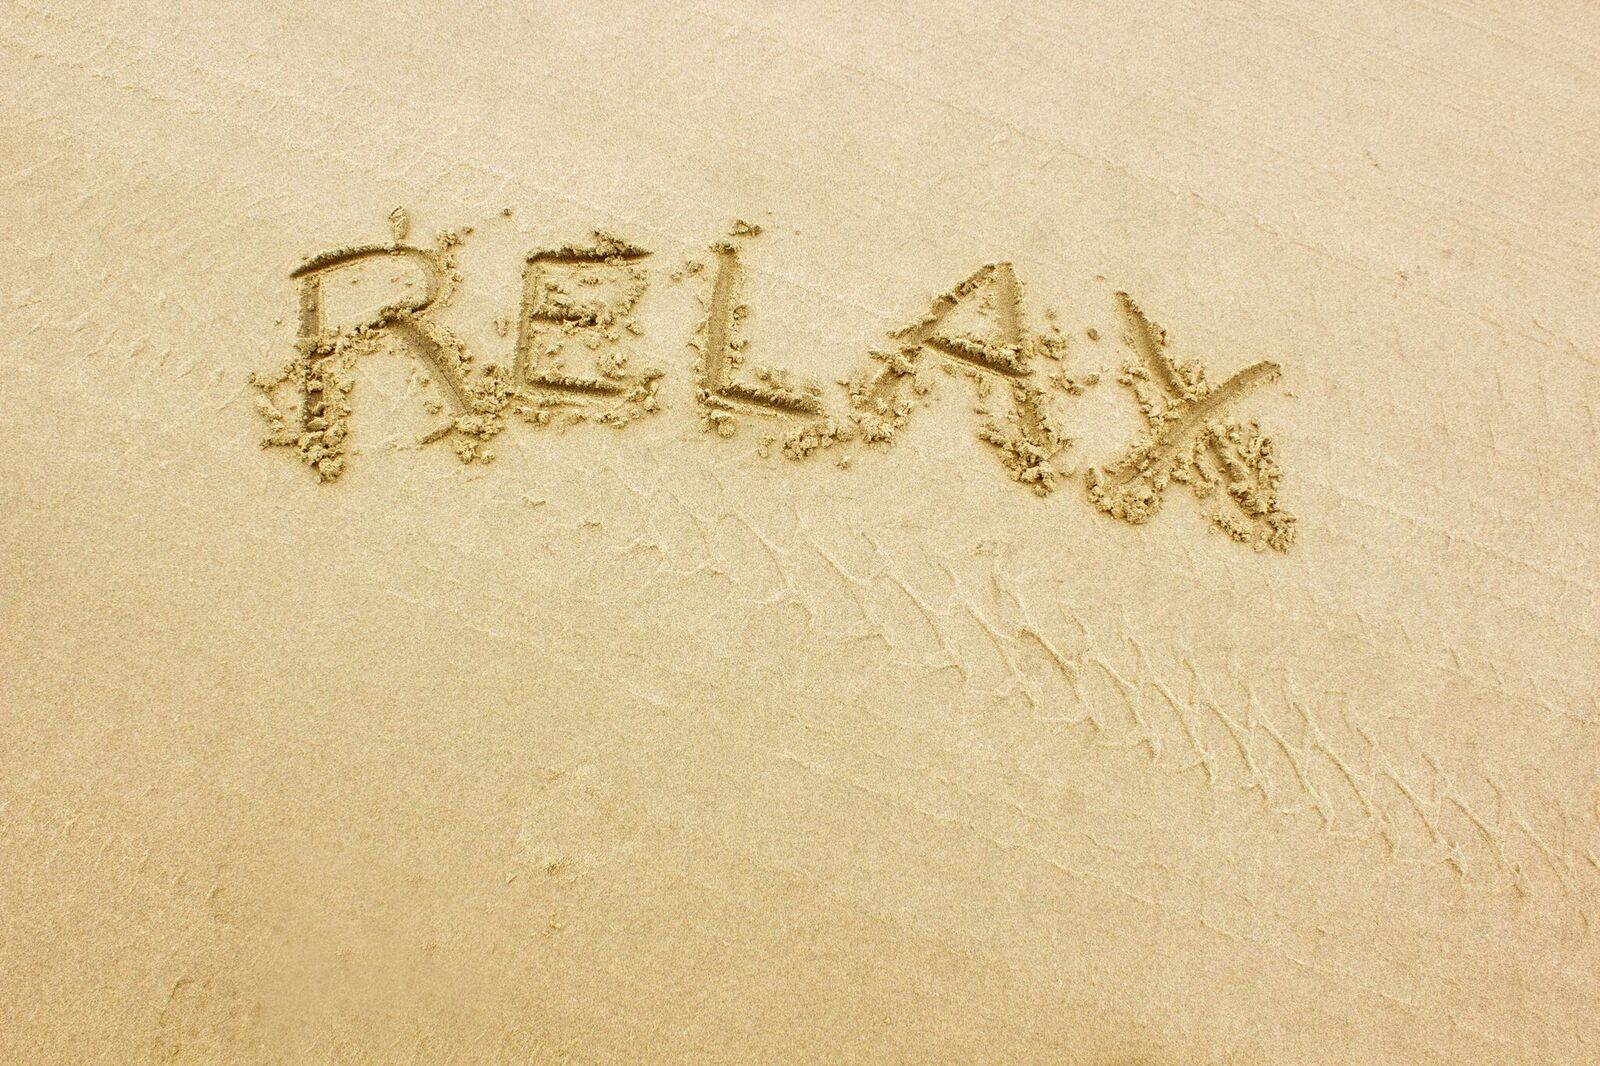 relax-text-san-writting_XJ3icb_preview.jpeg